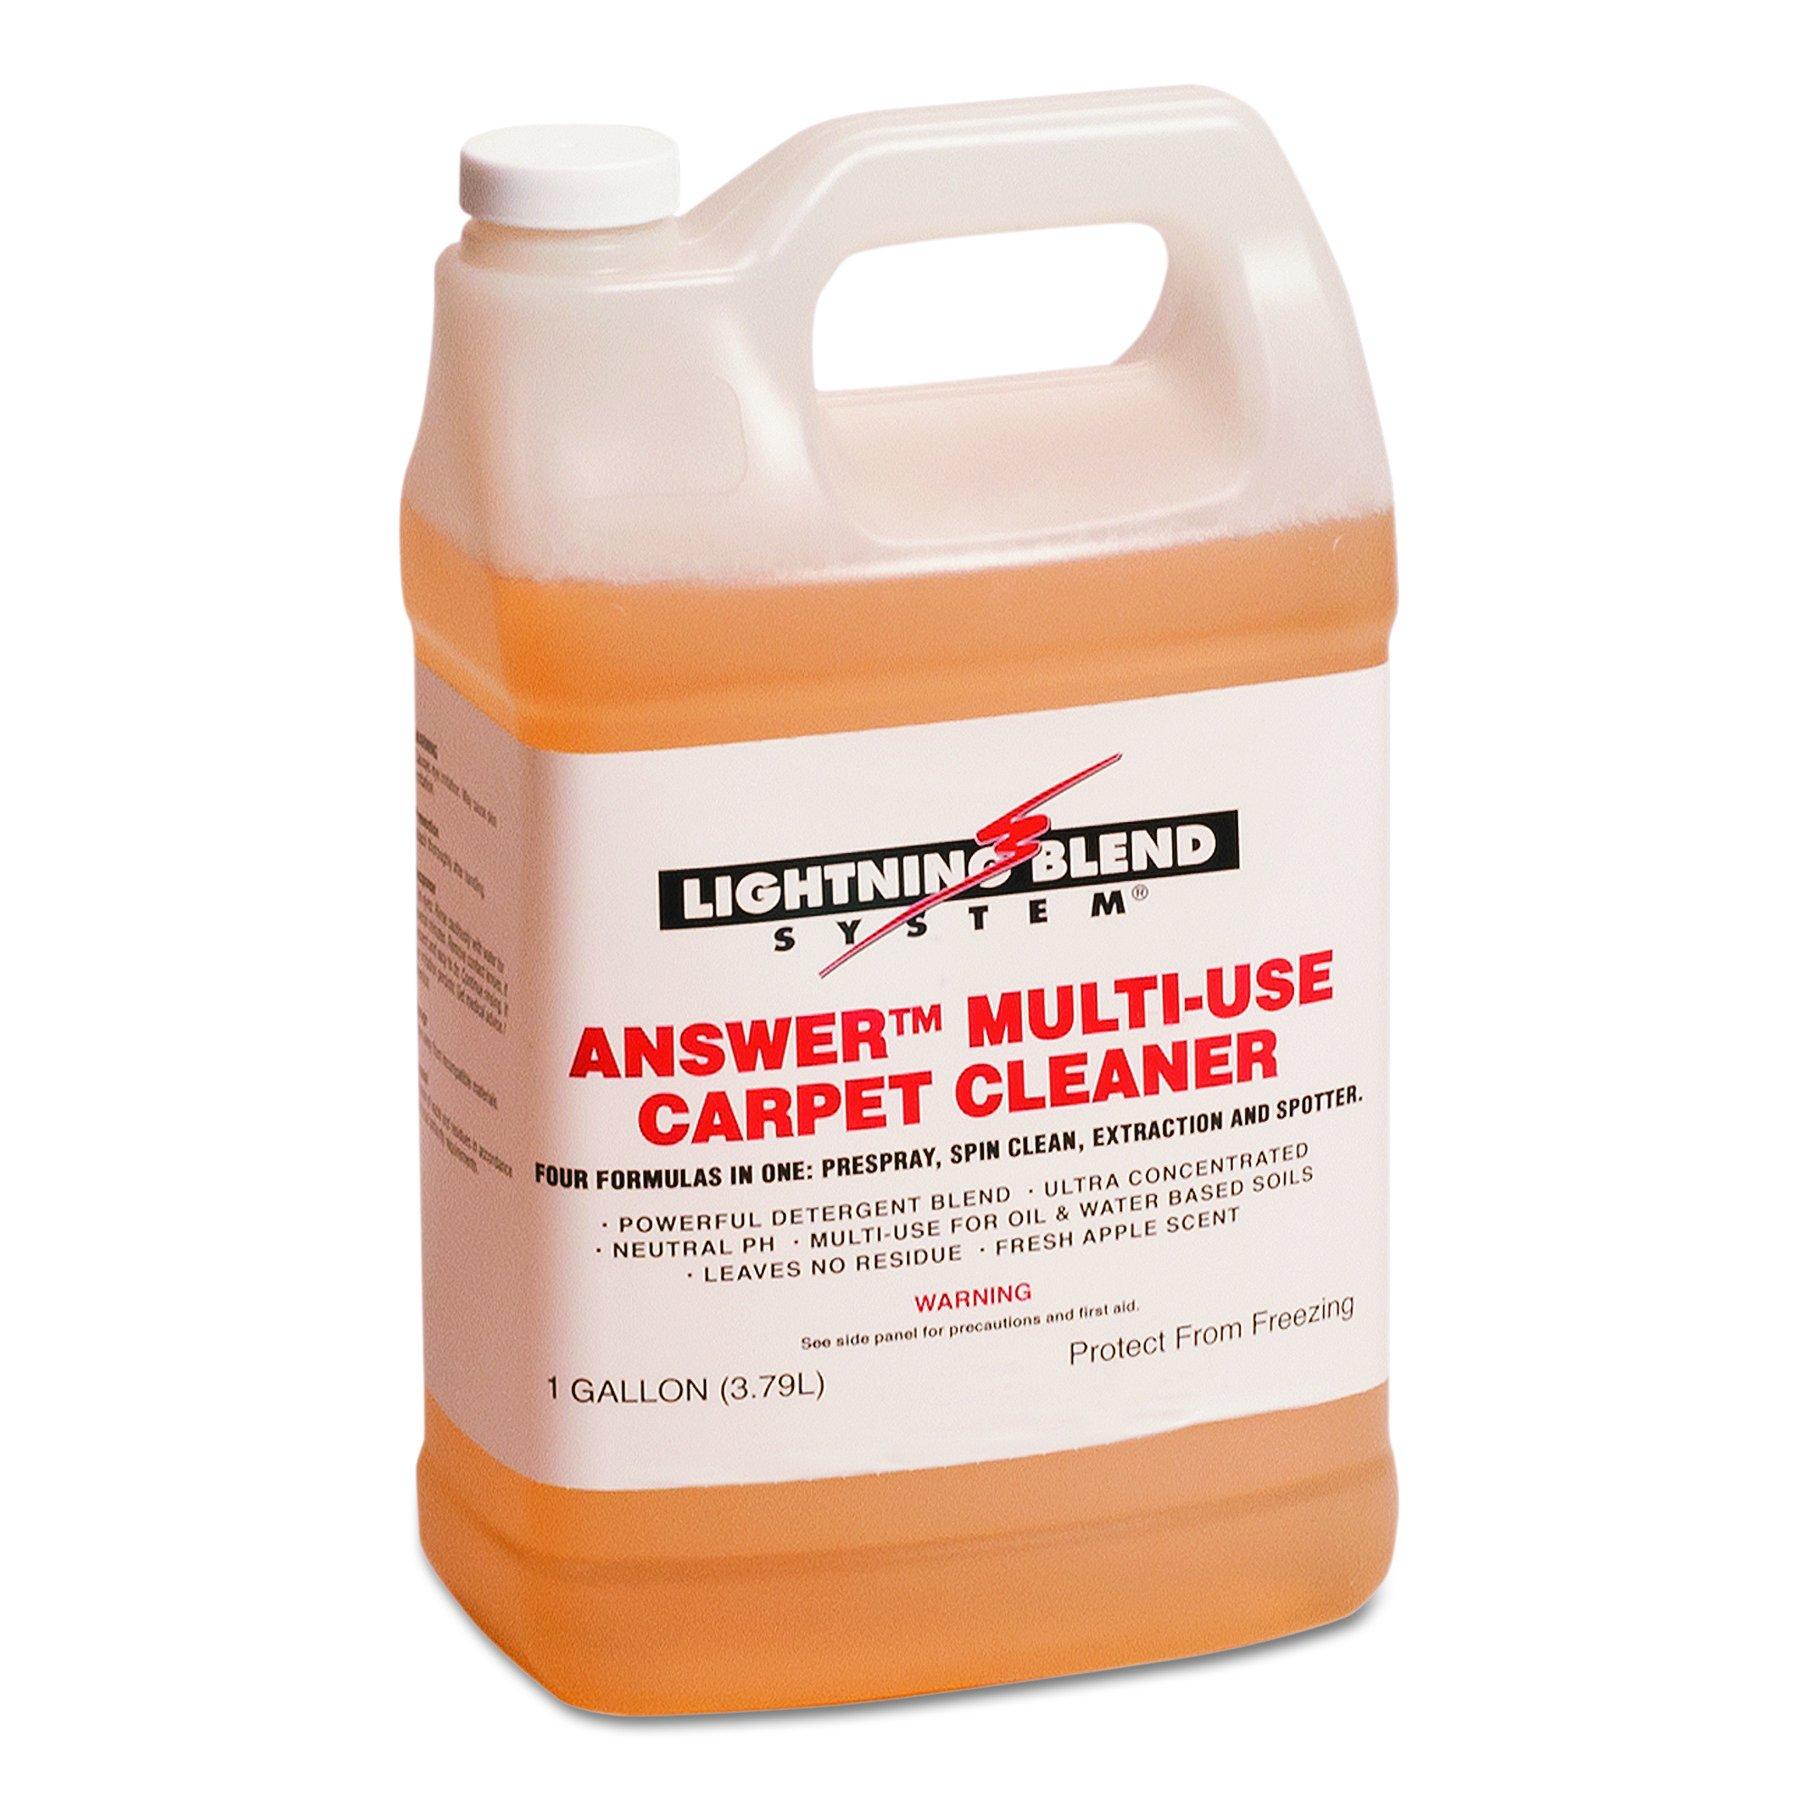 Answer F380422 1 Gallon LB II 21 Multi-Use Carpet Cleaner Bottle